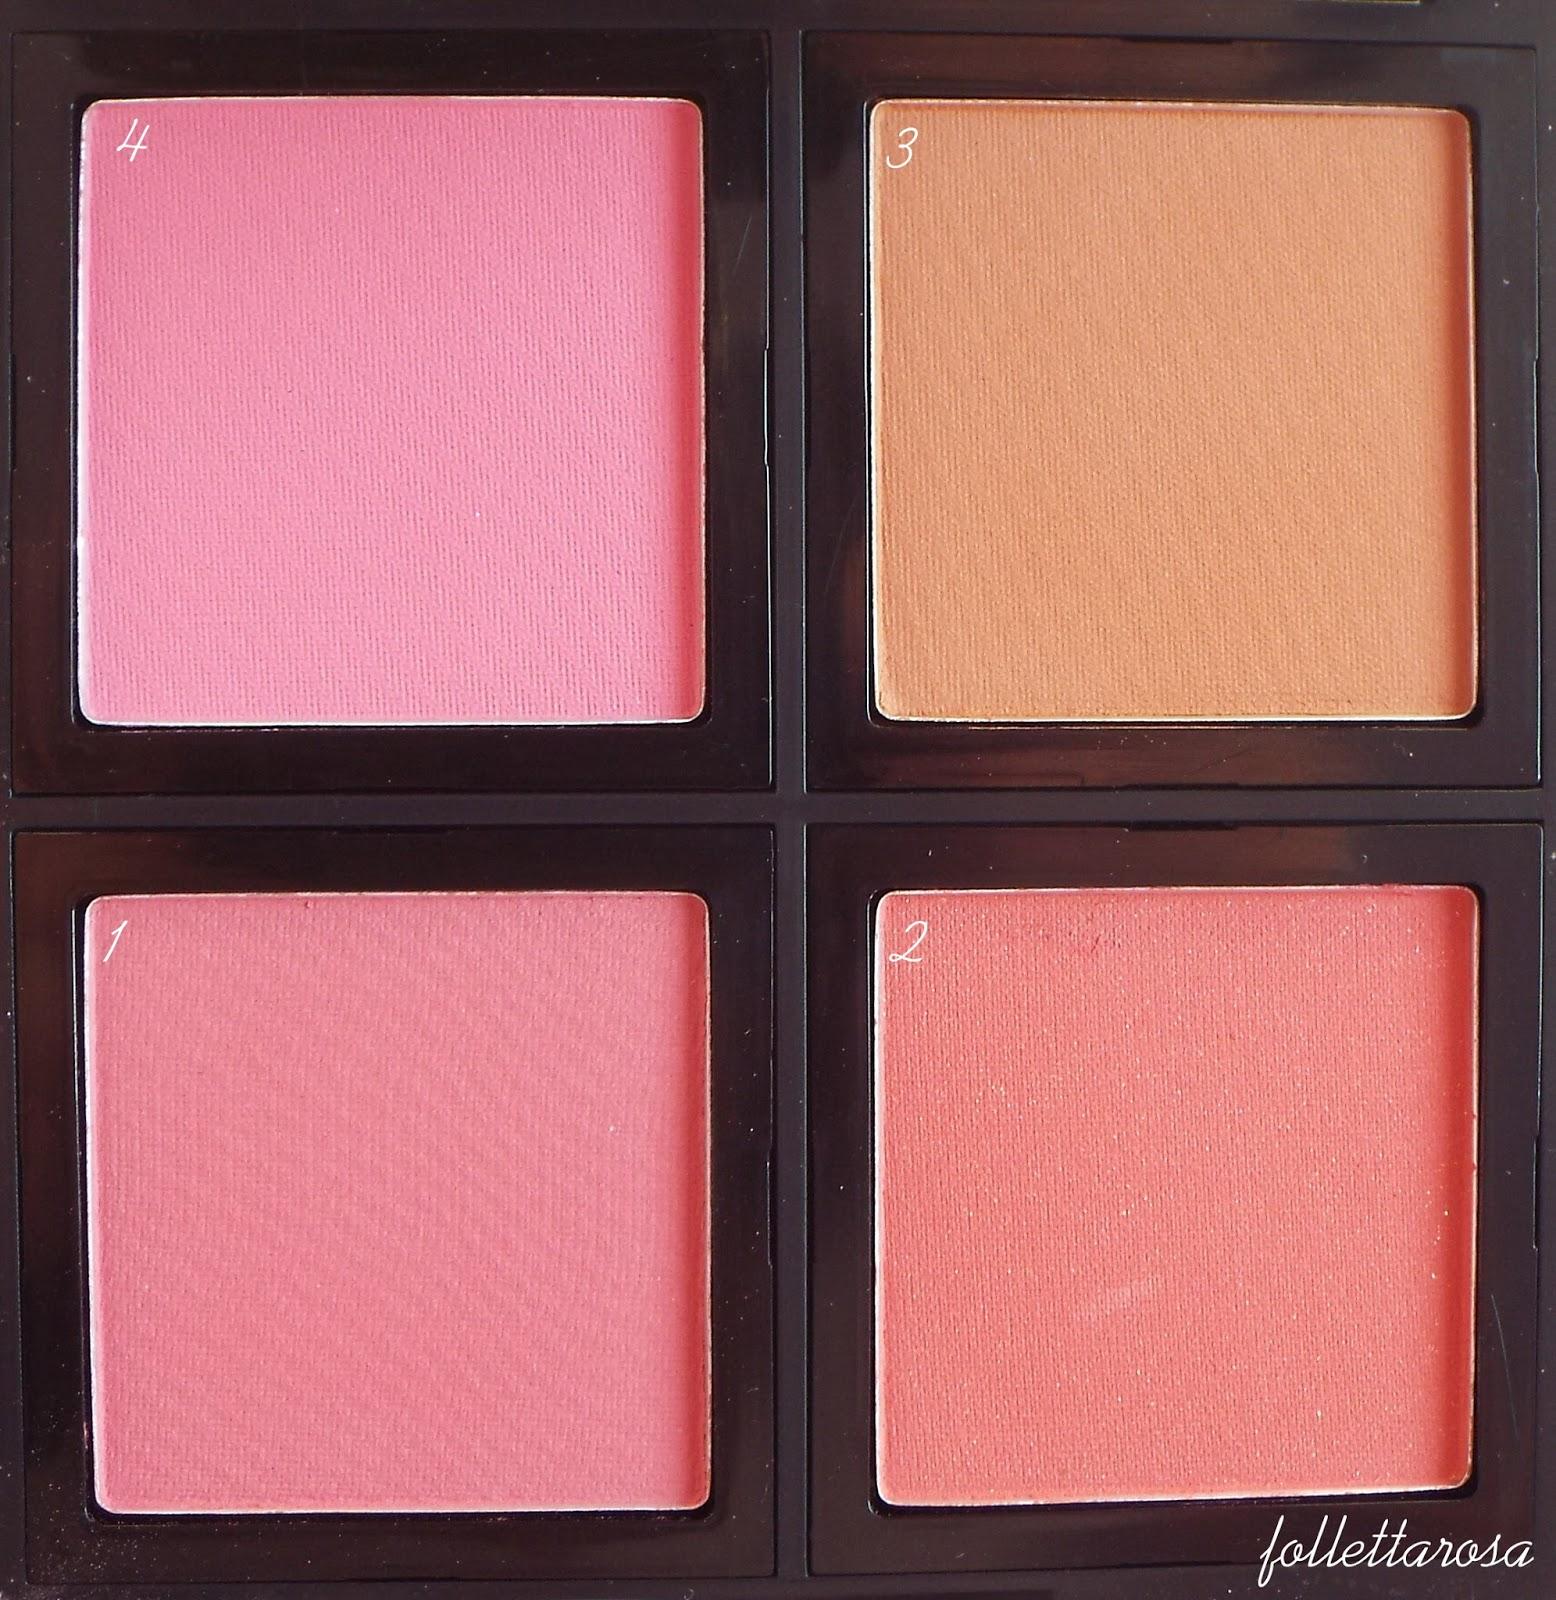 blush palette elf review